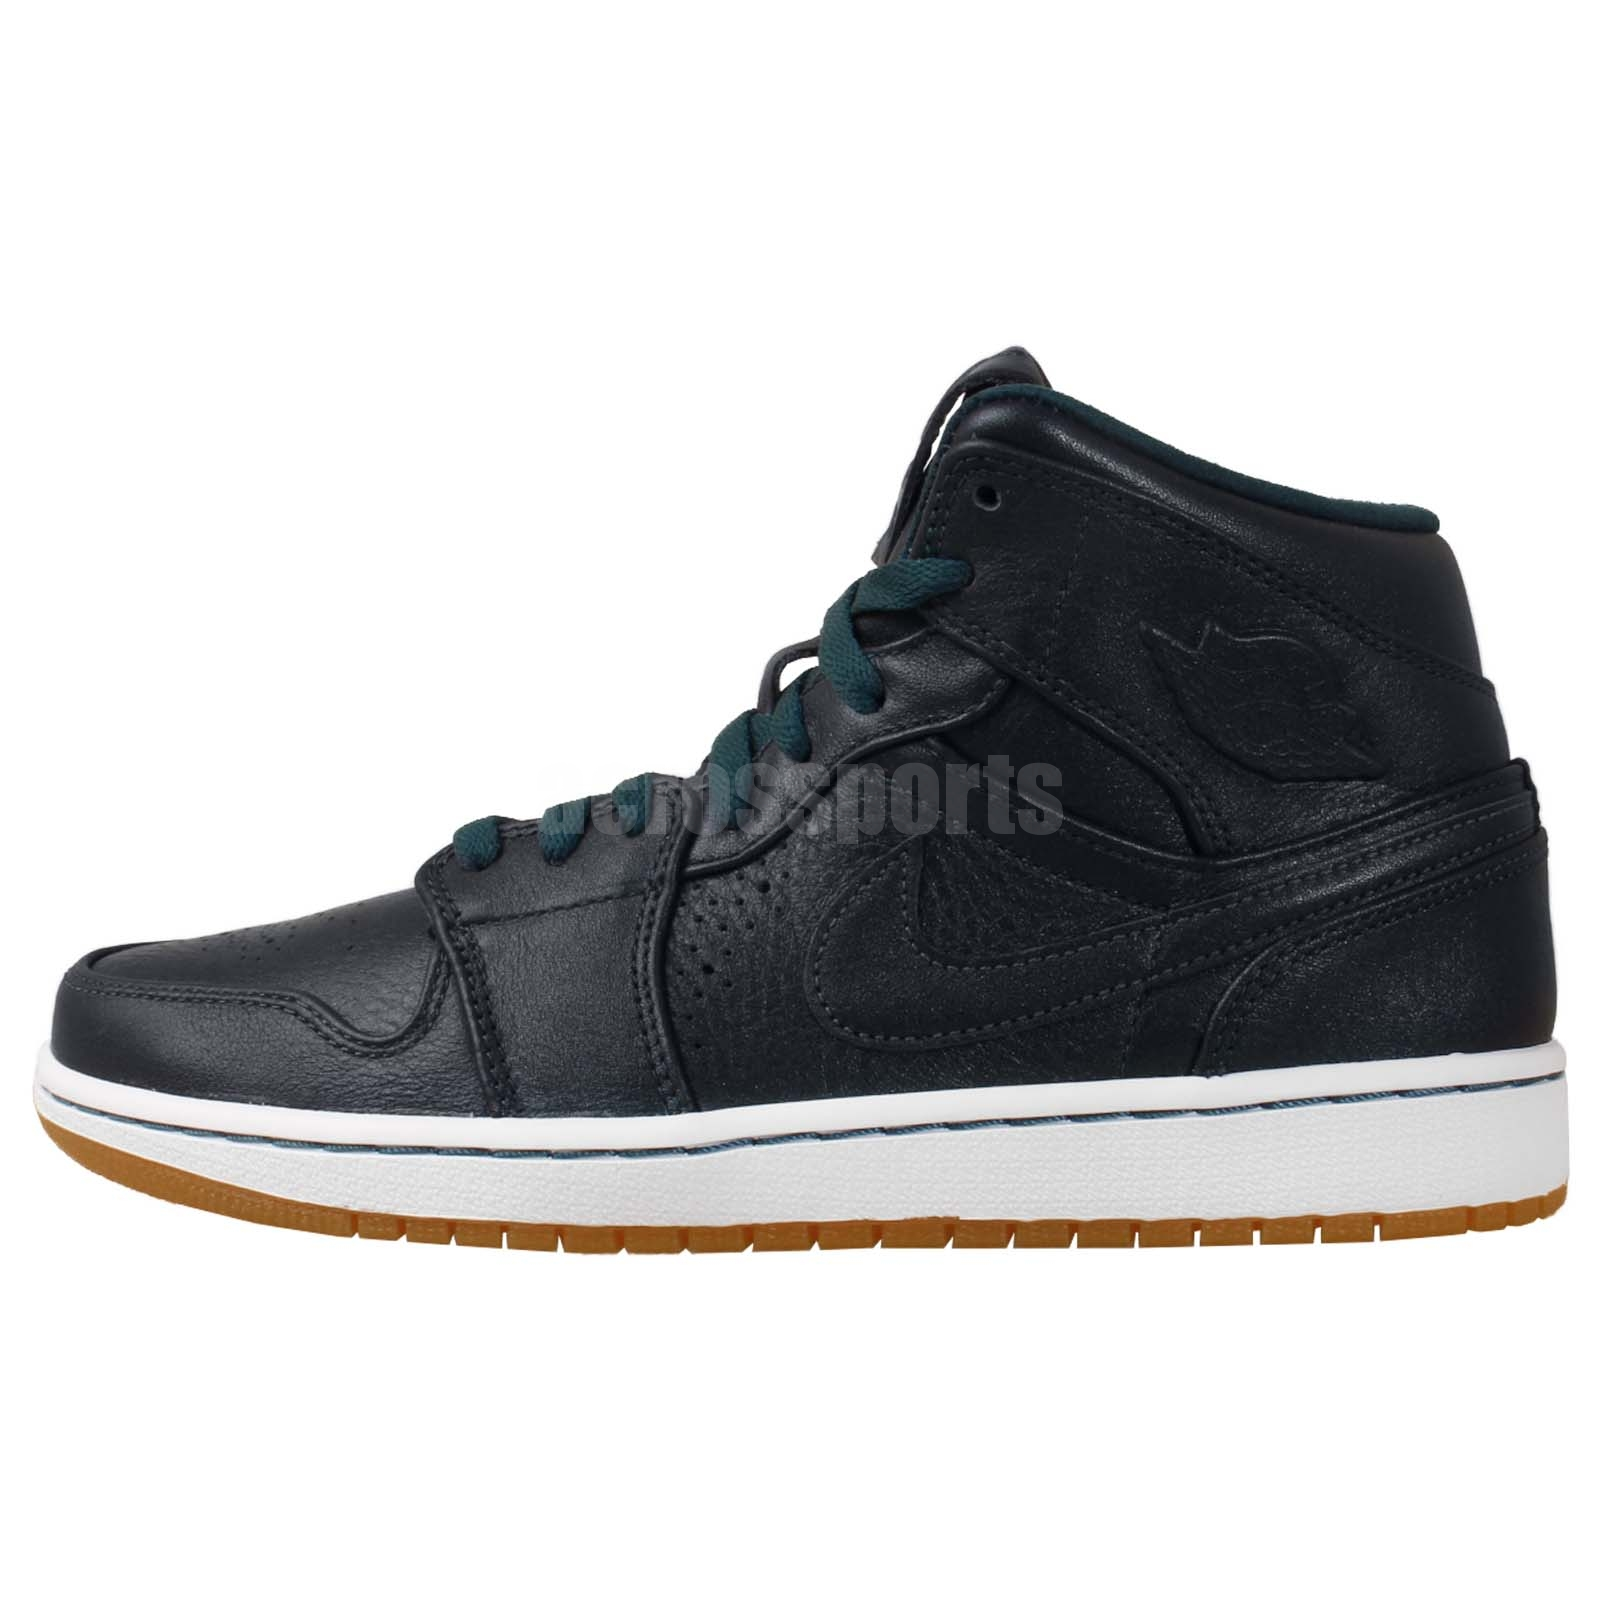 nike air jordan 1 mid nouveau aj1 navy mens shoes leather. Black Bedroom Furniture Sets. Home Design Ideas